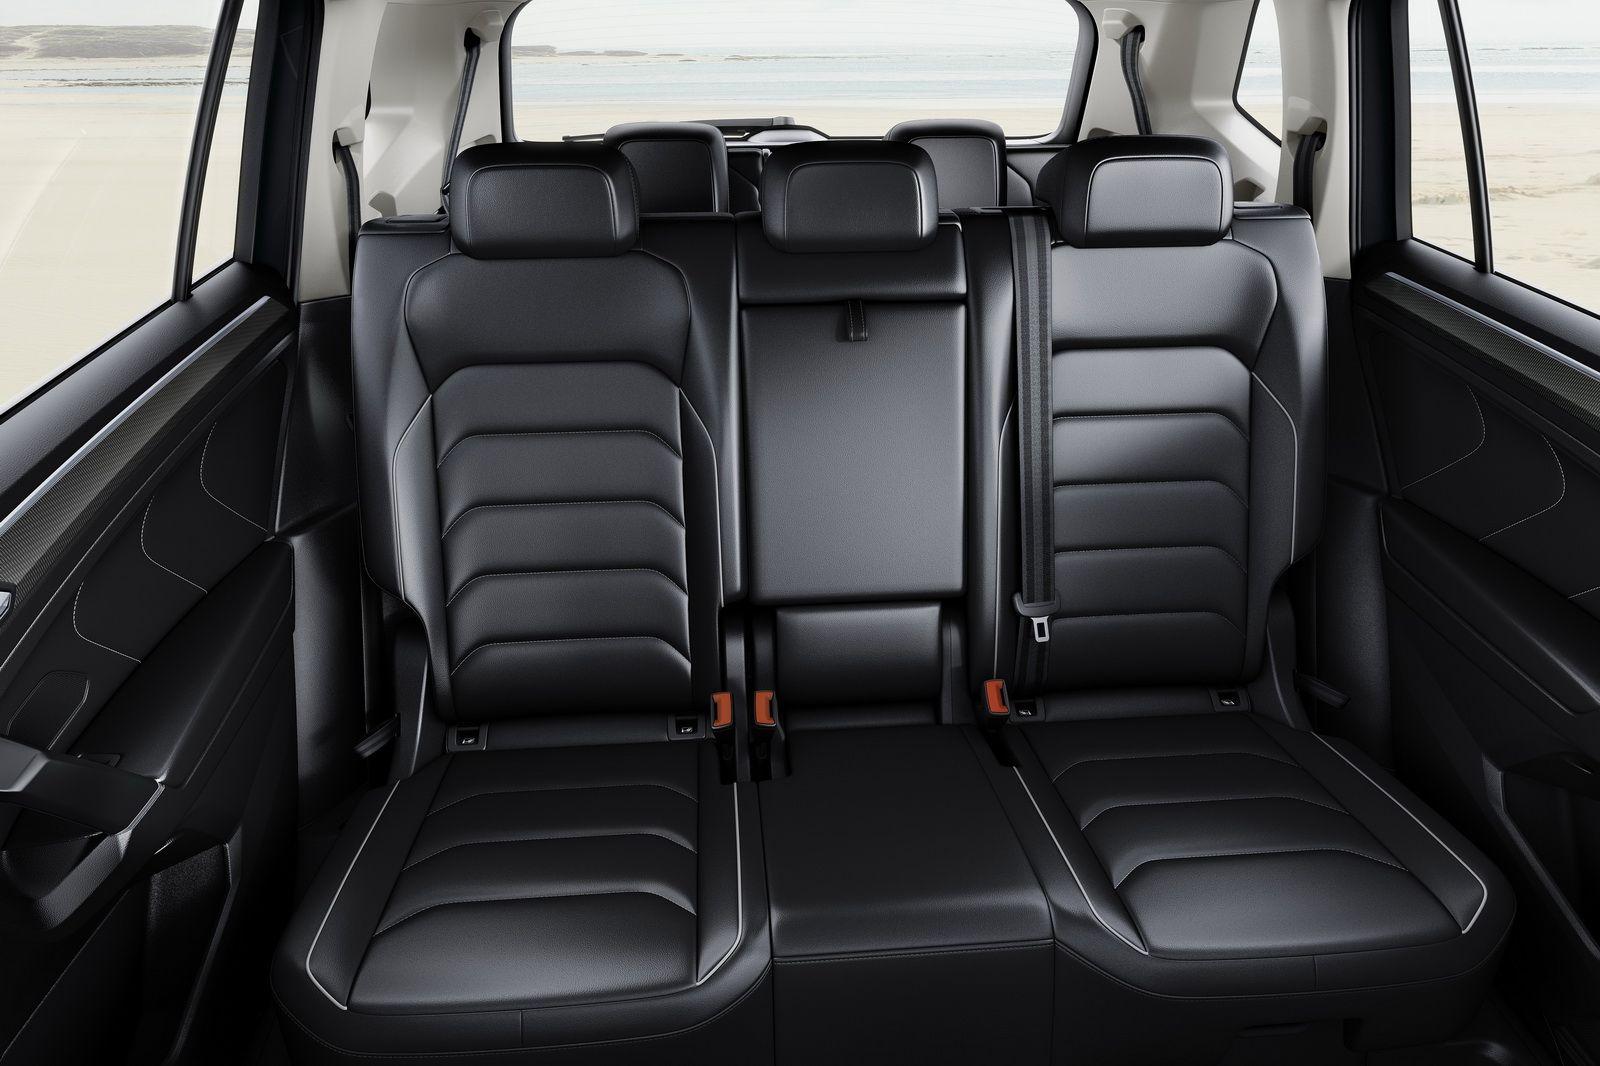 Europe S New Vw Tiguan Allspace With 7 Seats Detailed Ahead Of Geneva Carscoops Volkswagen Geneva Motor Show Car Interior